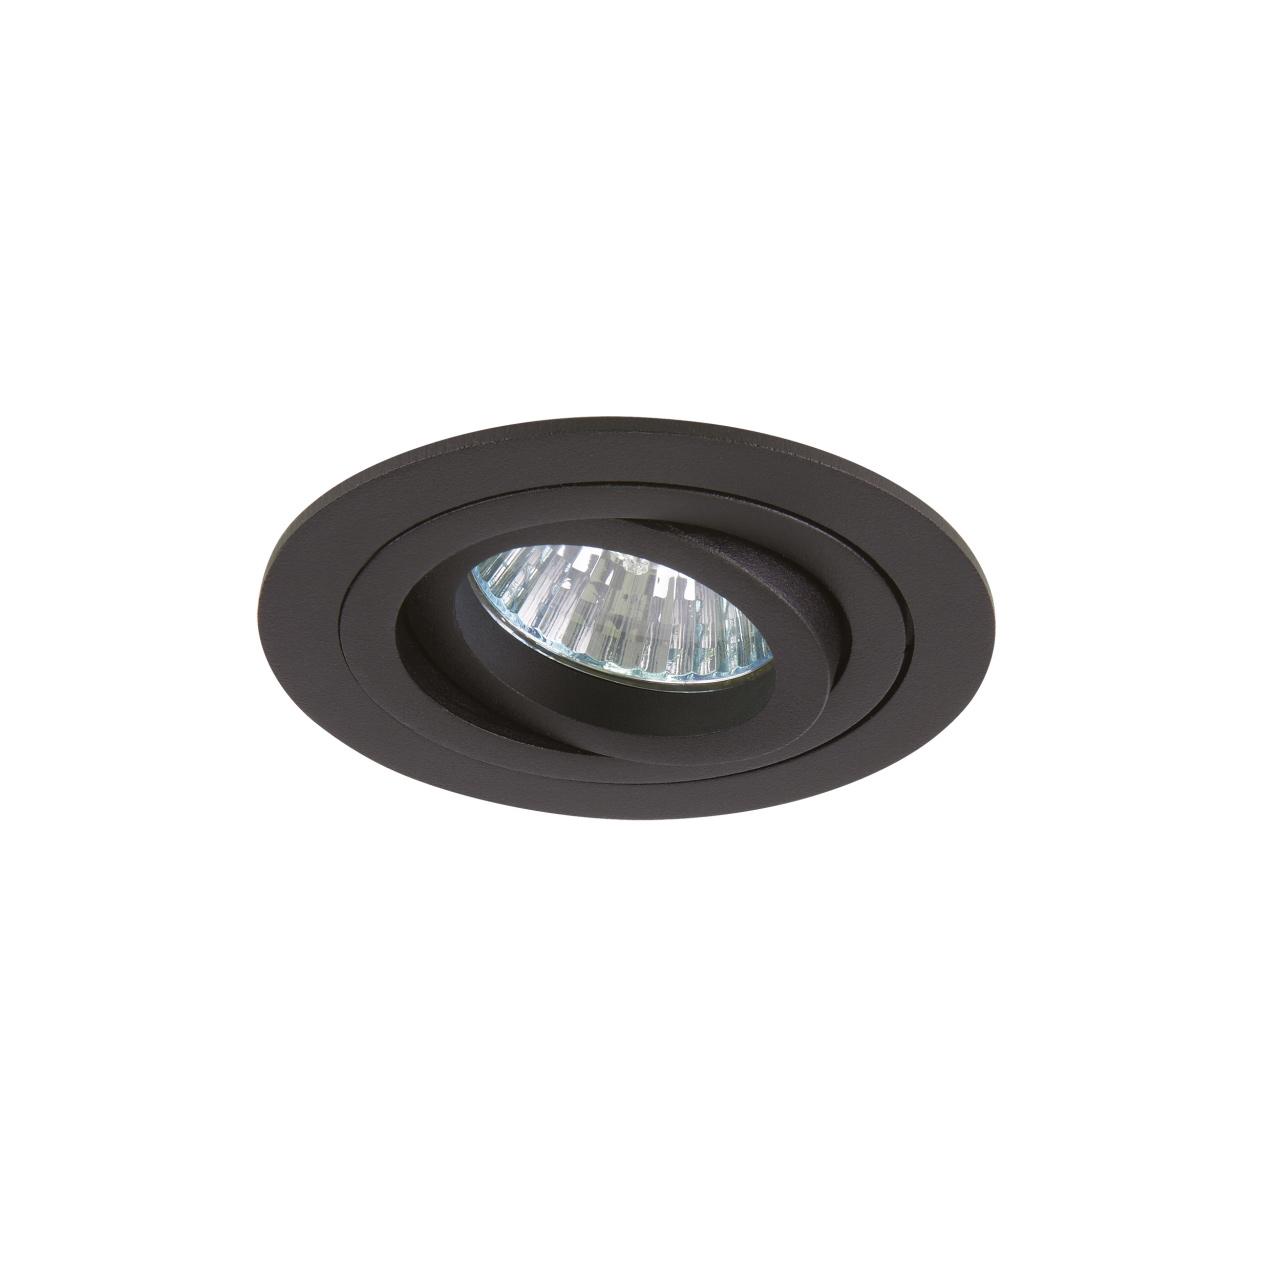 Светильник Intero 16 HP16 черный Lightstar 214217